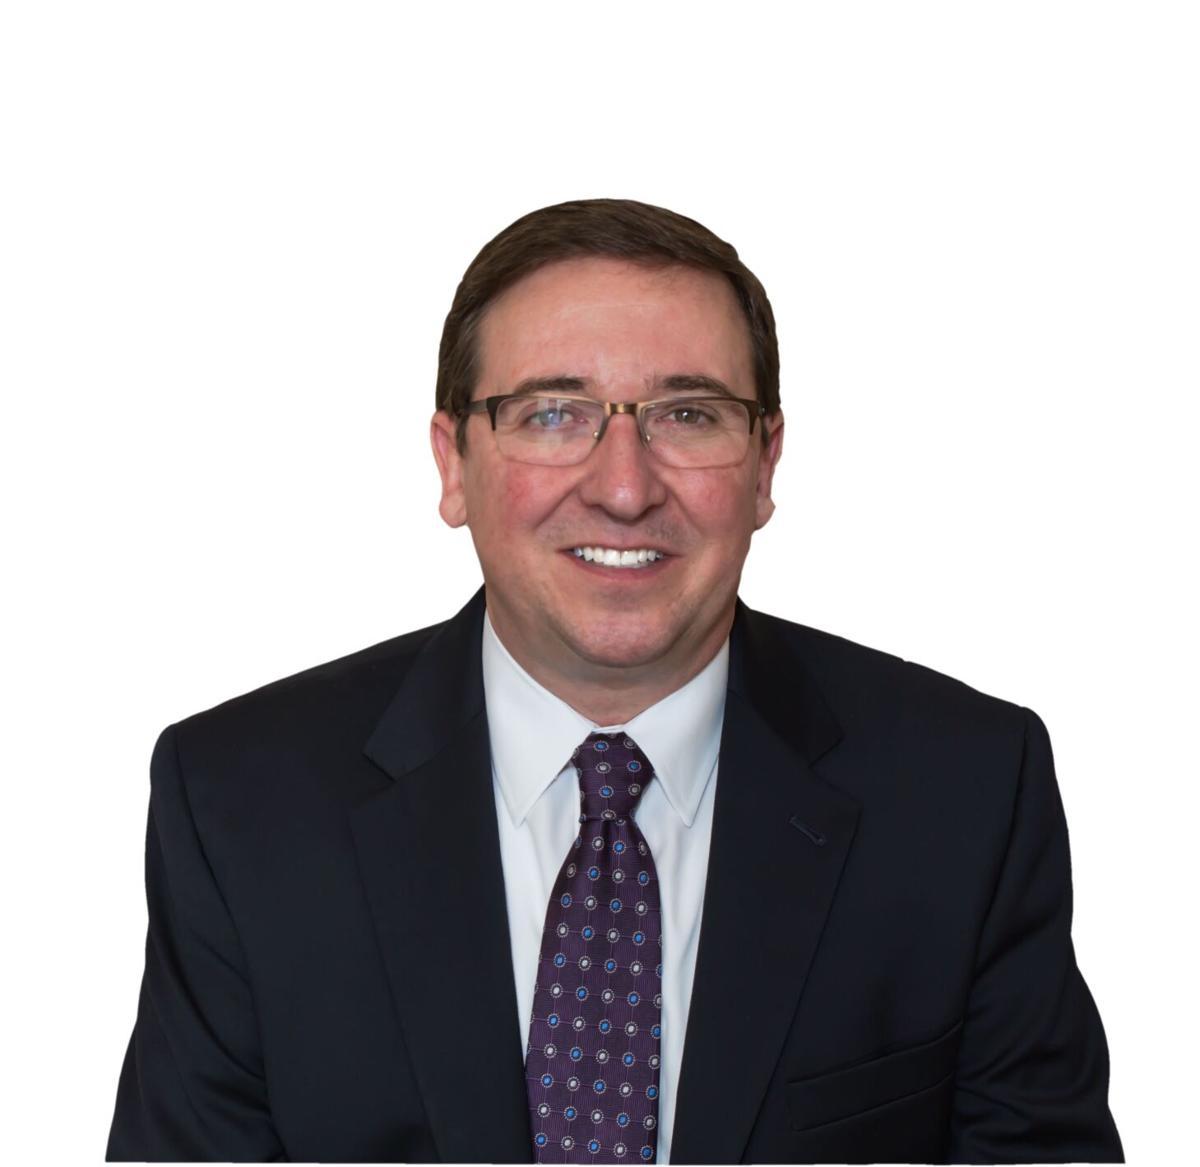 Dr. Tom Starling